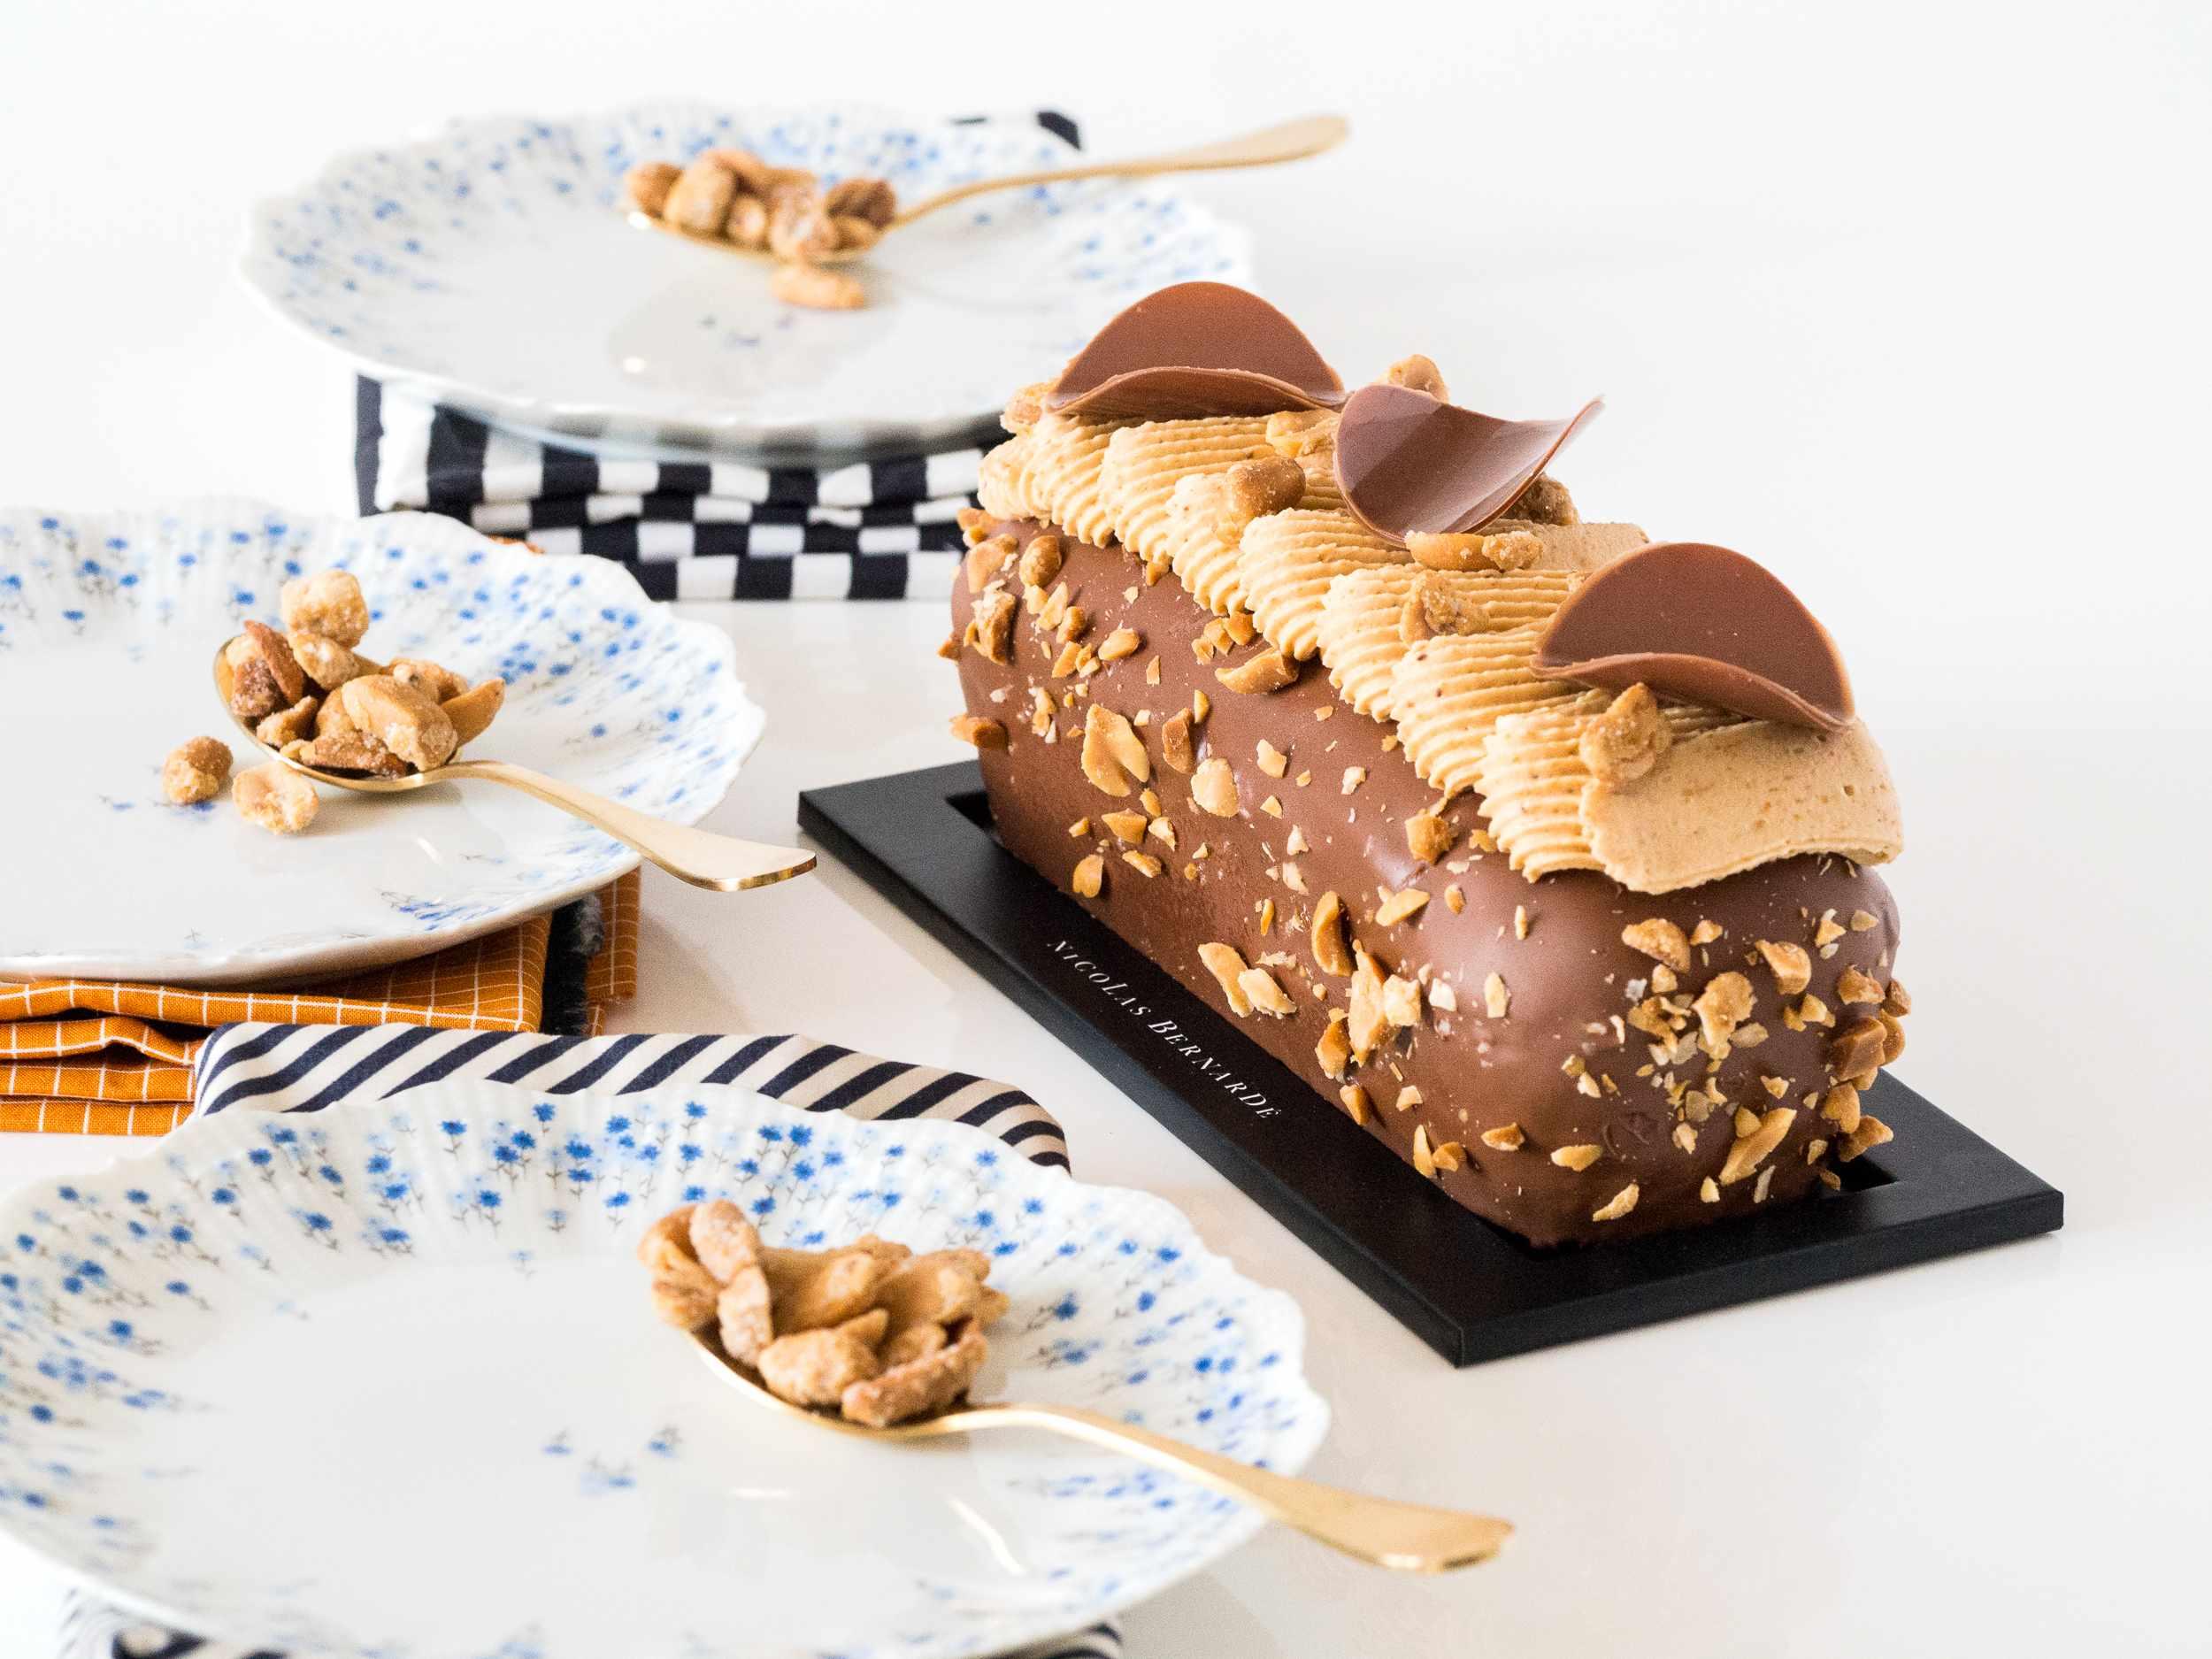 Cake chocolat et cacahuète